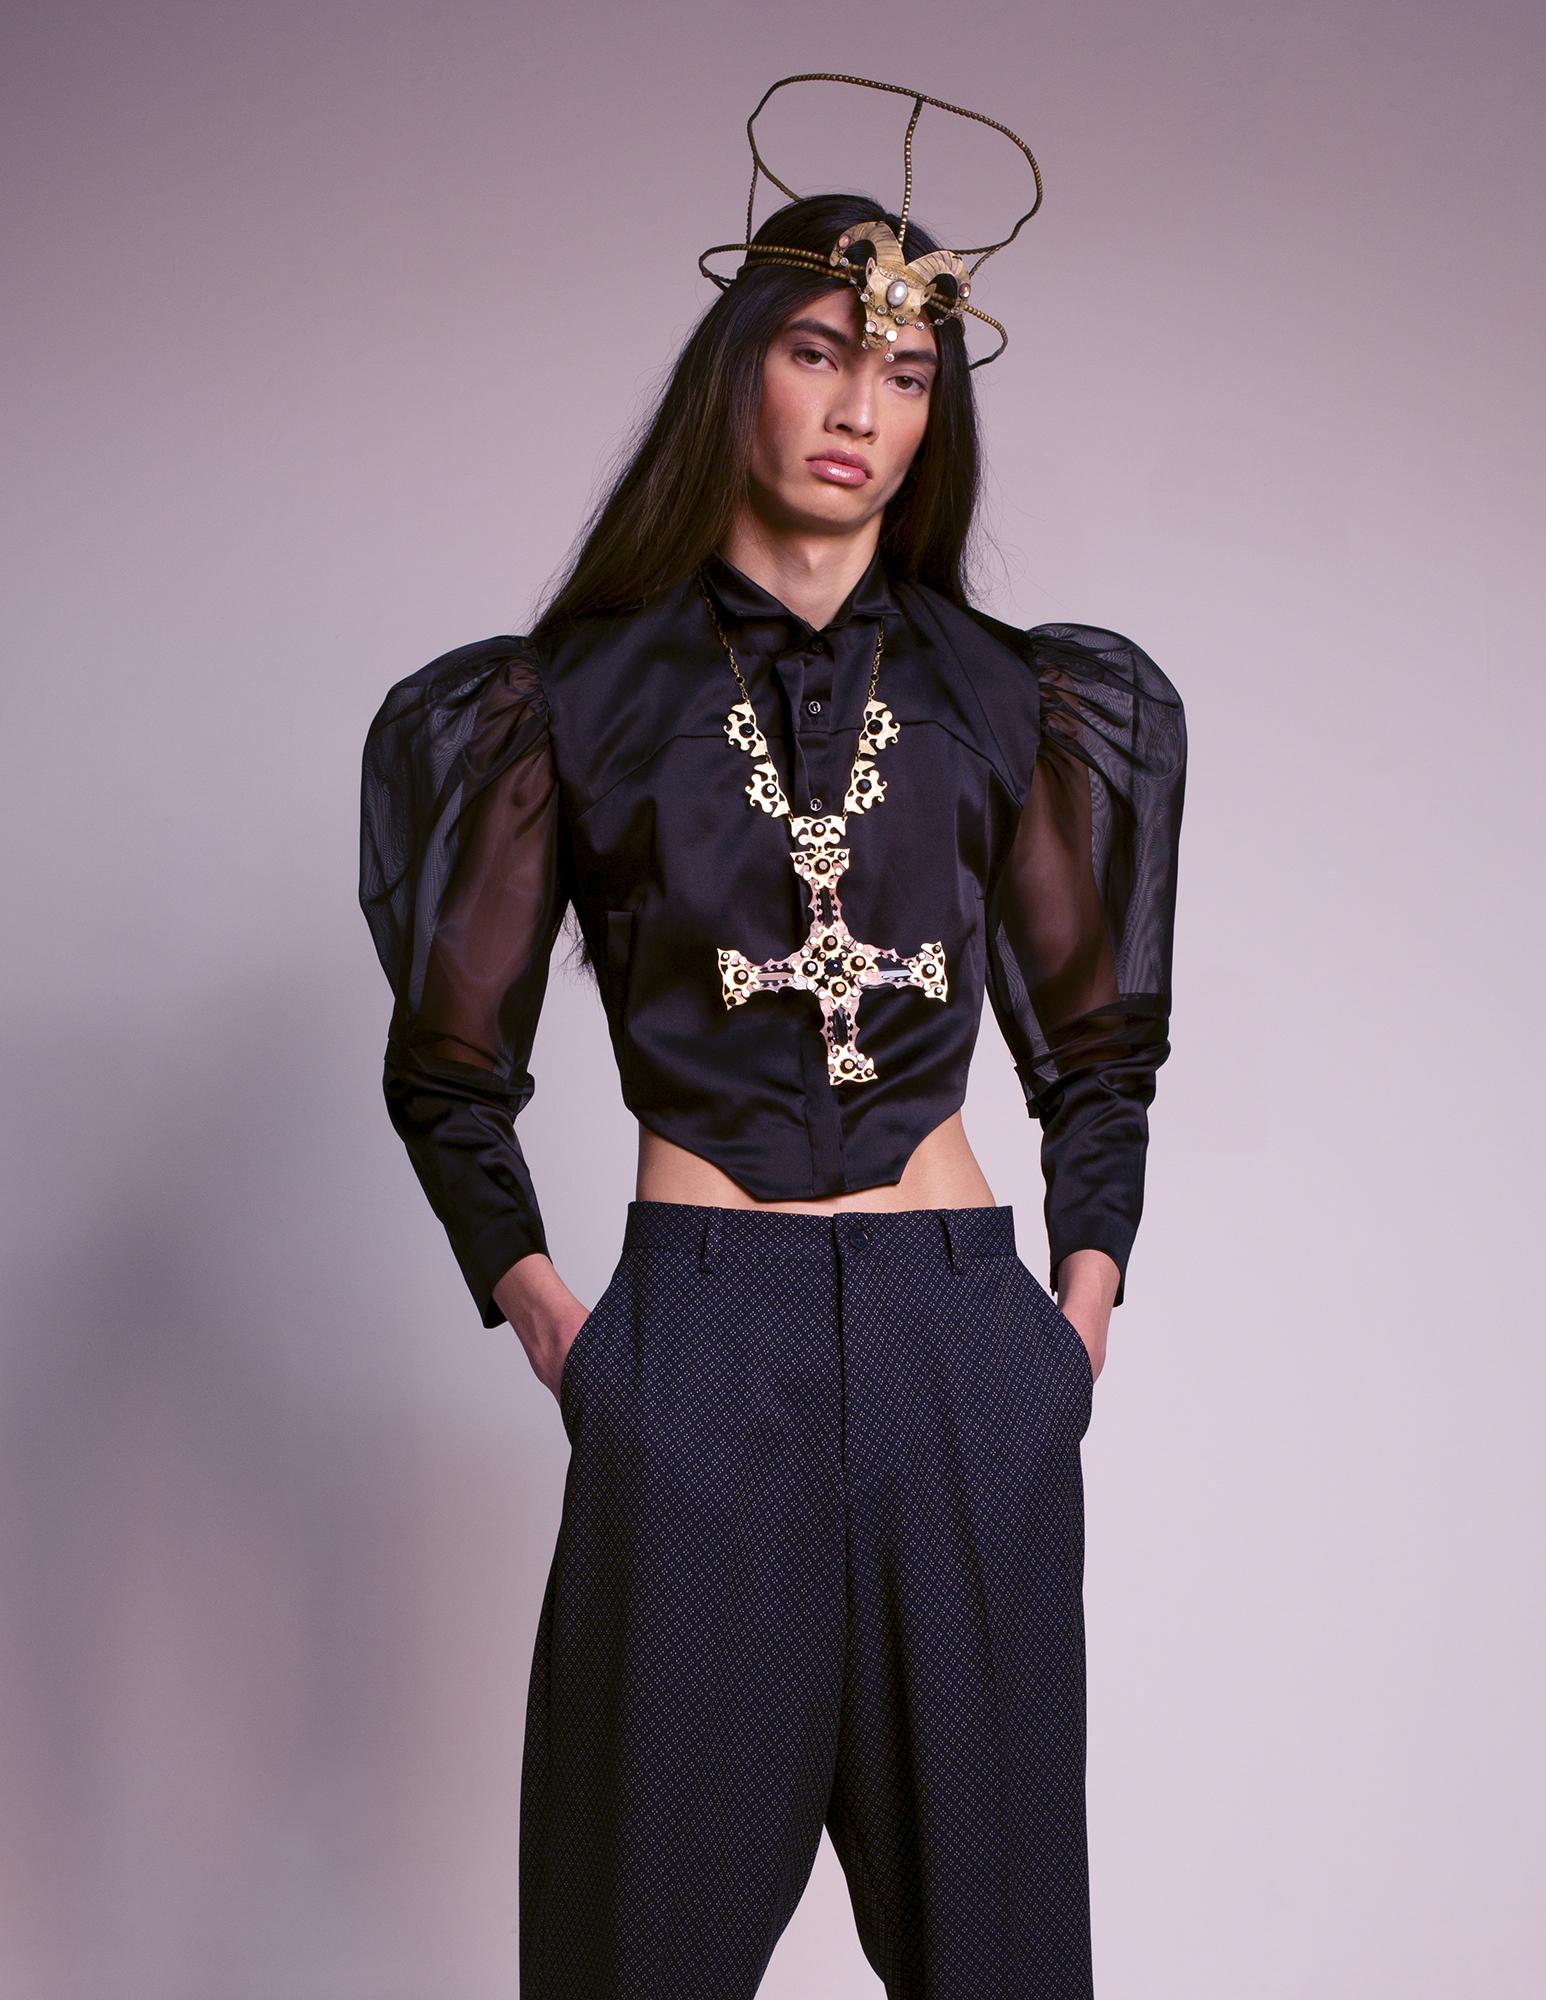 Black Puff Sleeve Top SADIE CLAYTON  Trousers ASOS DESIGN  Sandals DR MARTENS  Headpiece SLIM BARRETT  Cross Jeweled Necklace SLIM BARRETT